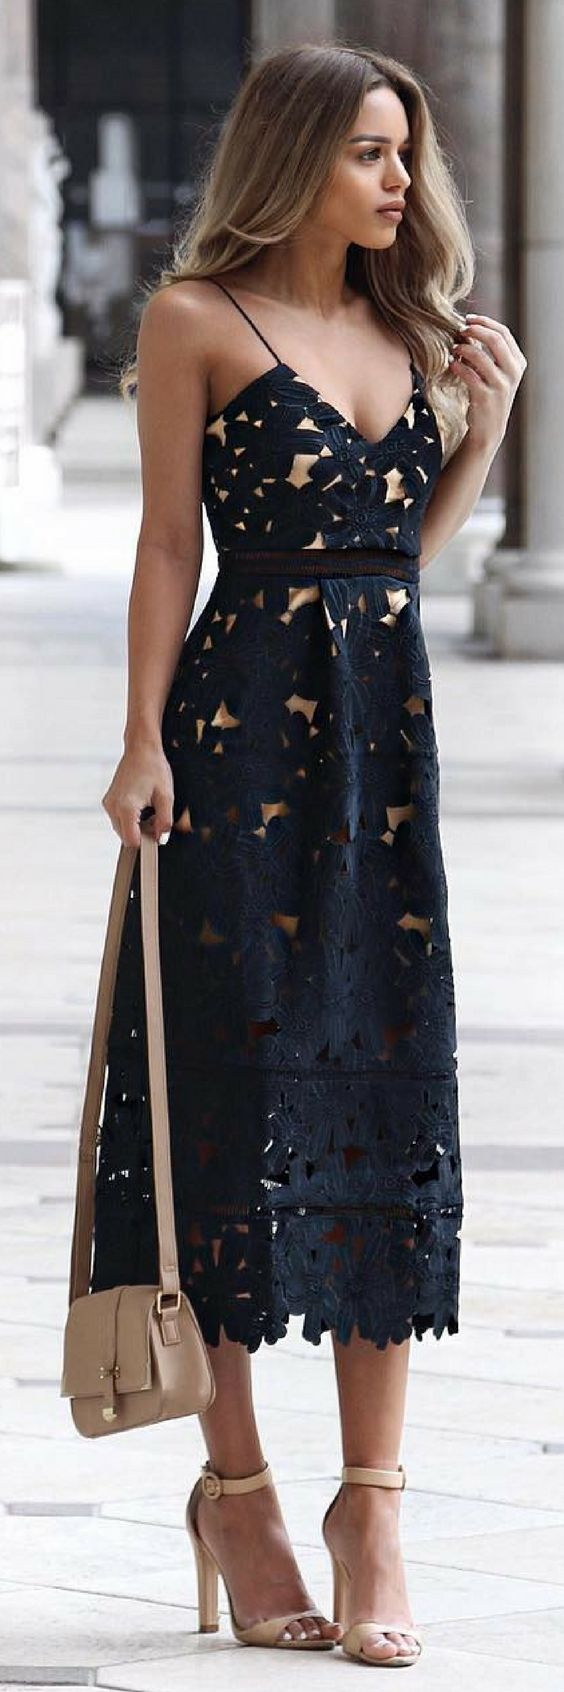 Floral Crochet Midi Dress // Fashion Look by Nada Adelle